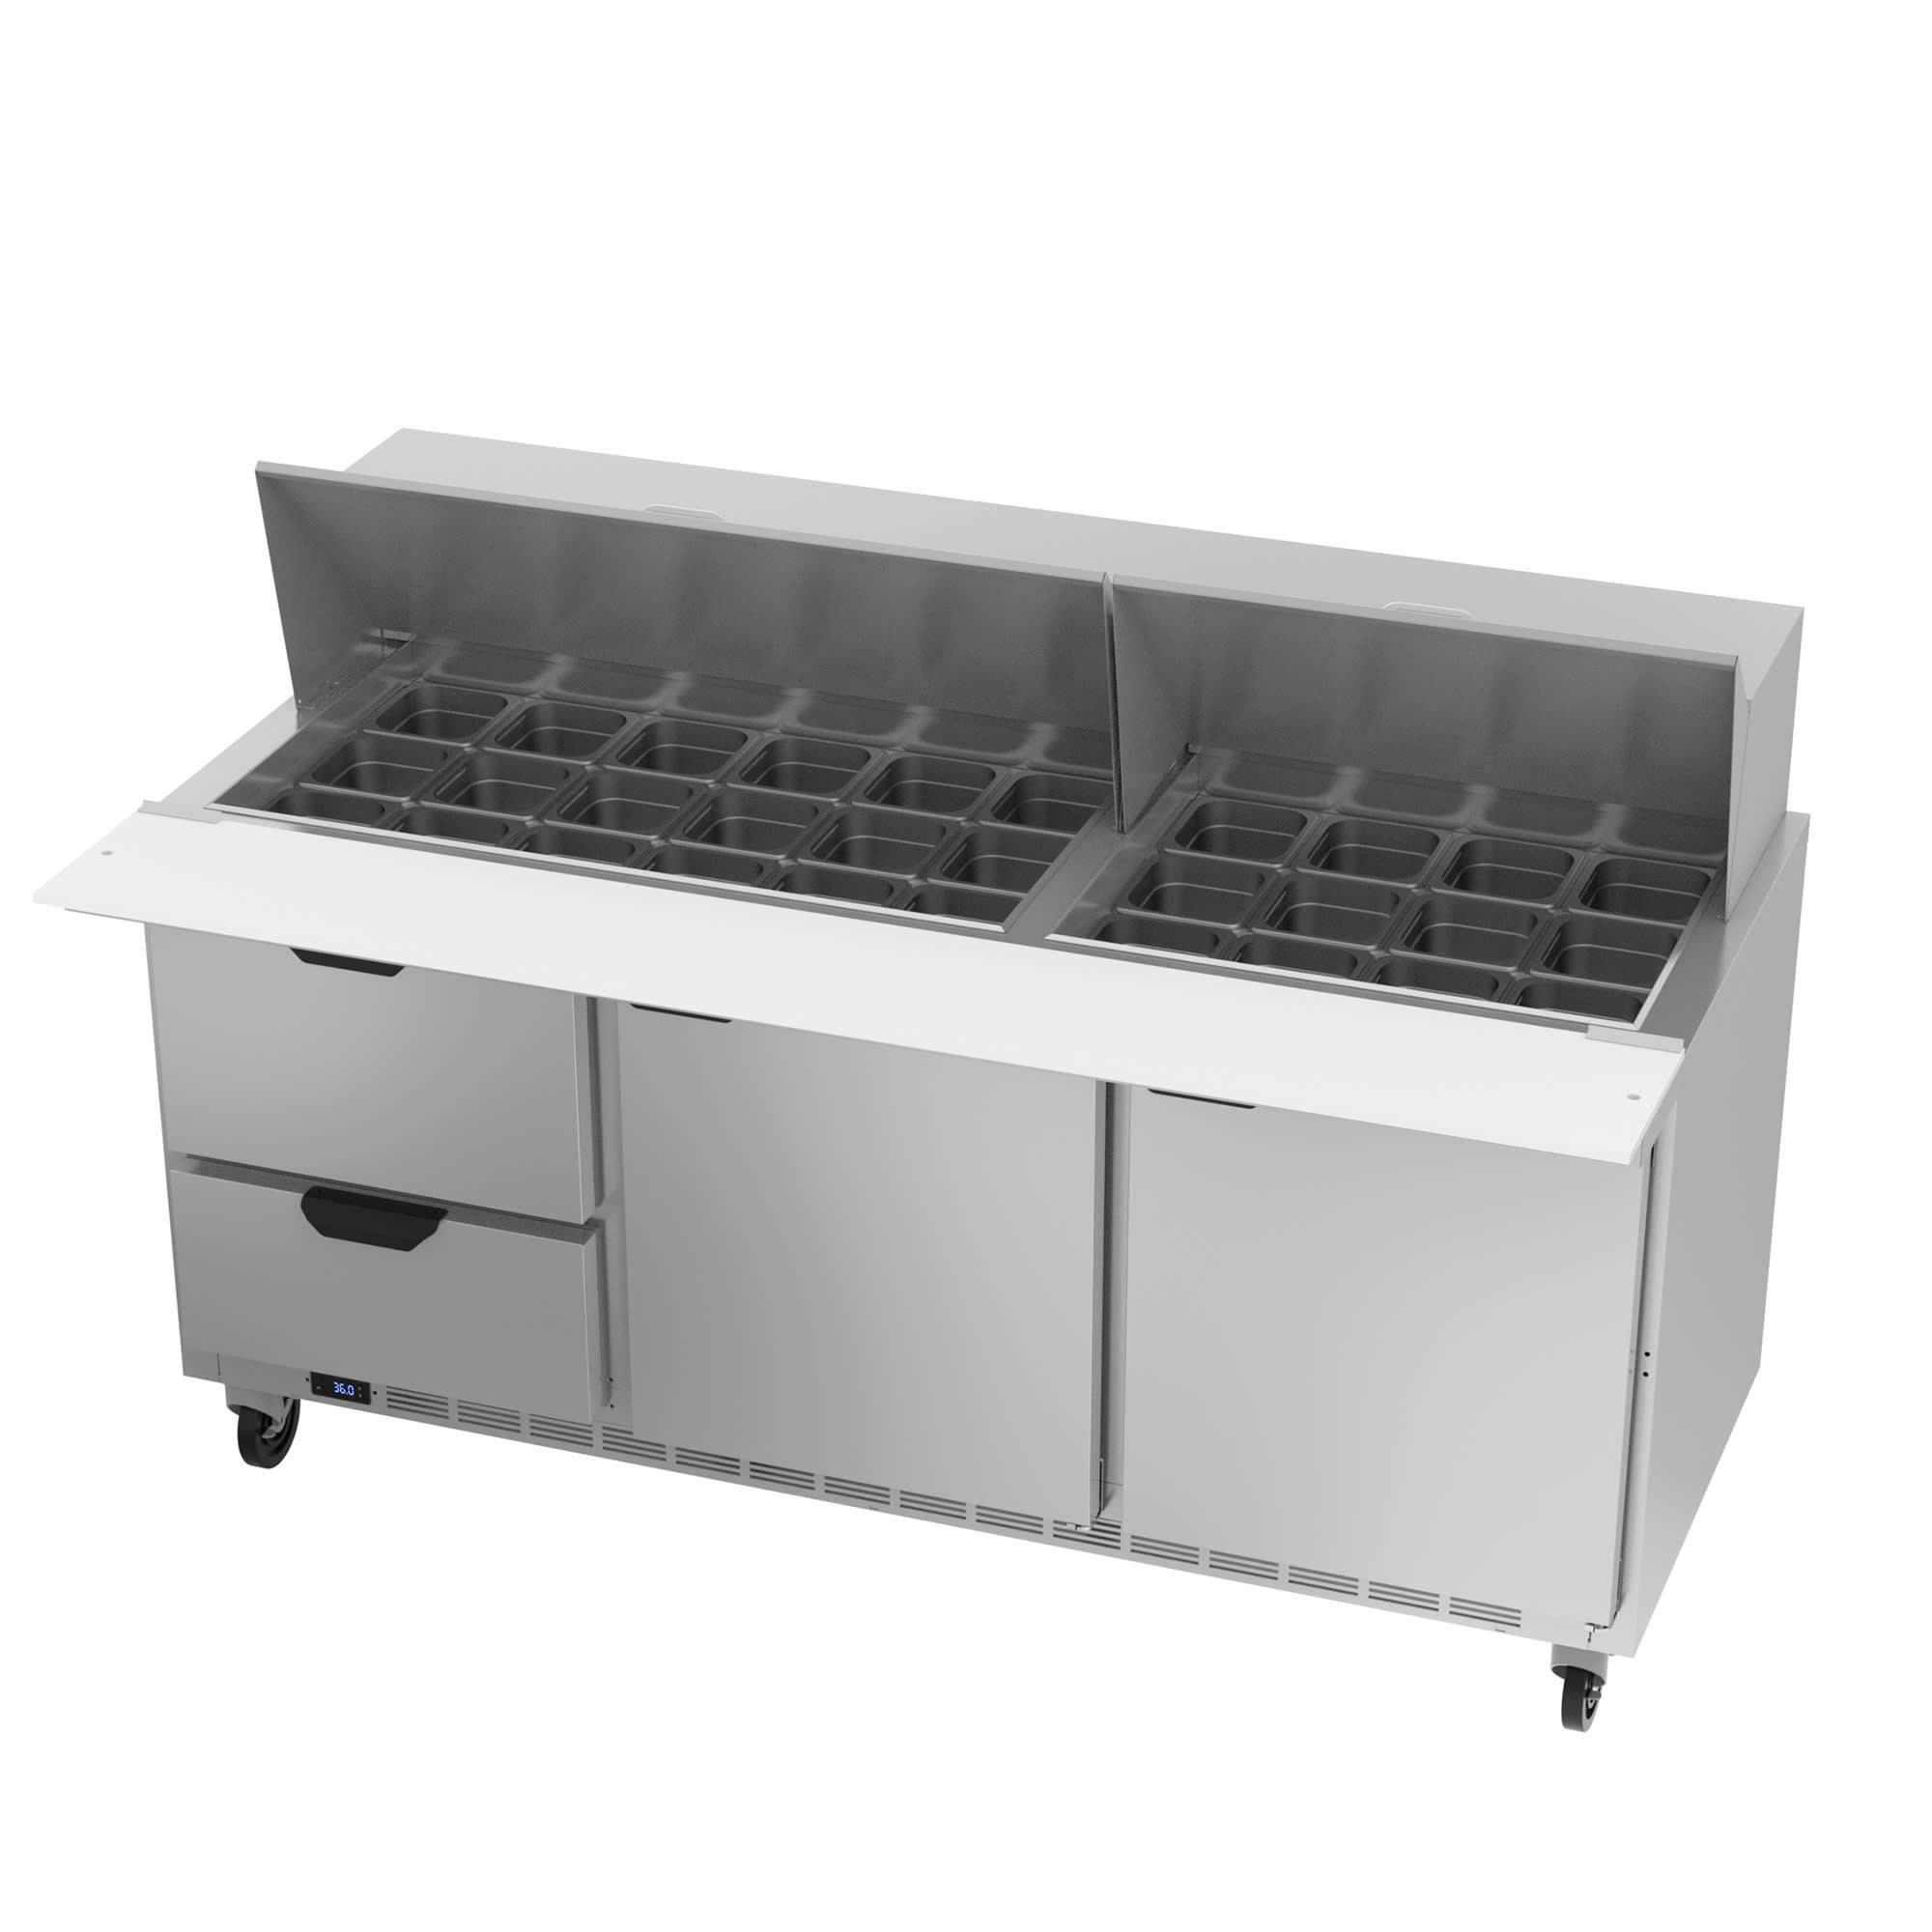 "Beverage Air SPED72HC-30M-2 72"" Mega Top Sandwich/Salad Prep Table w/ Refrigerated Base, 115v"